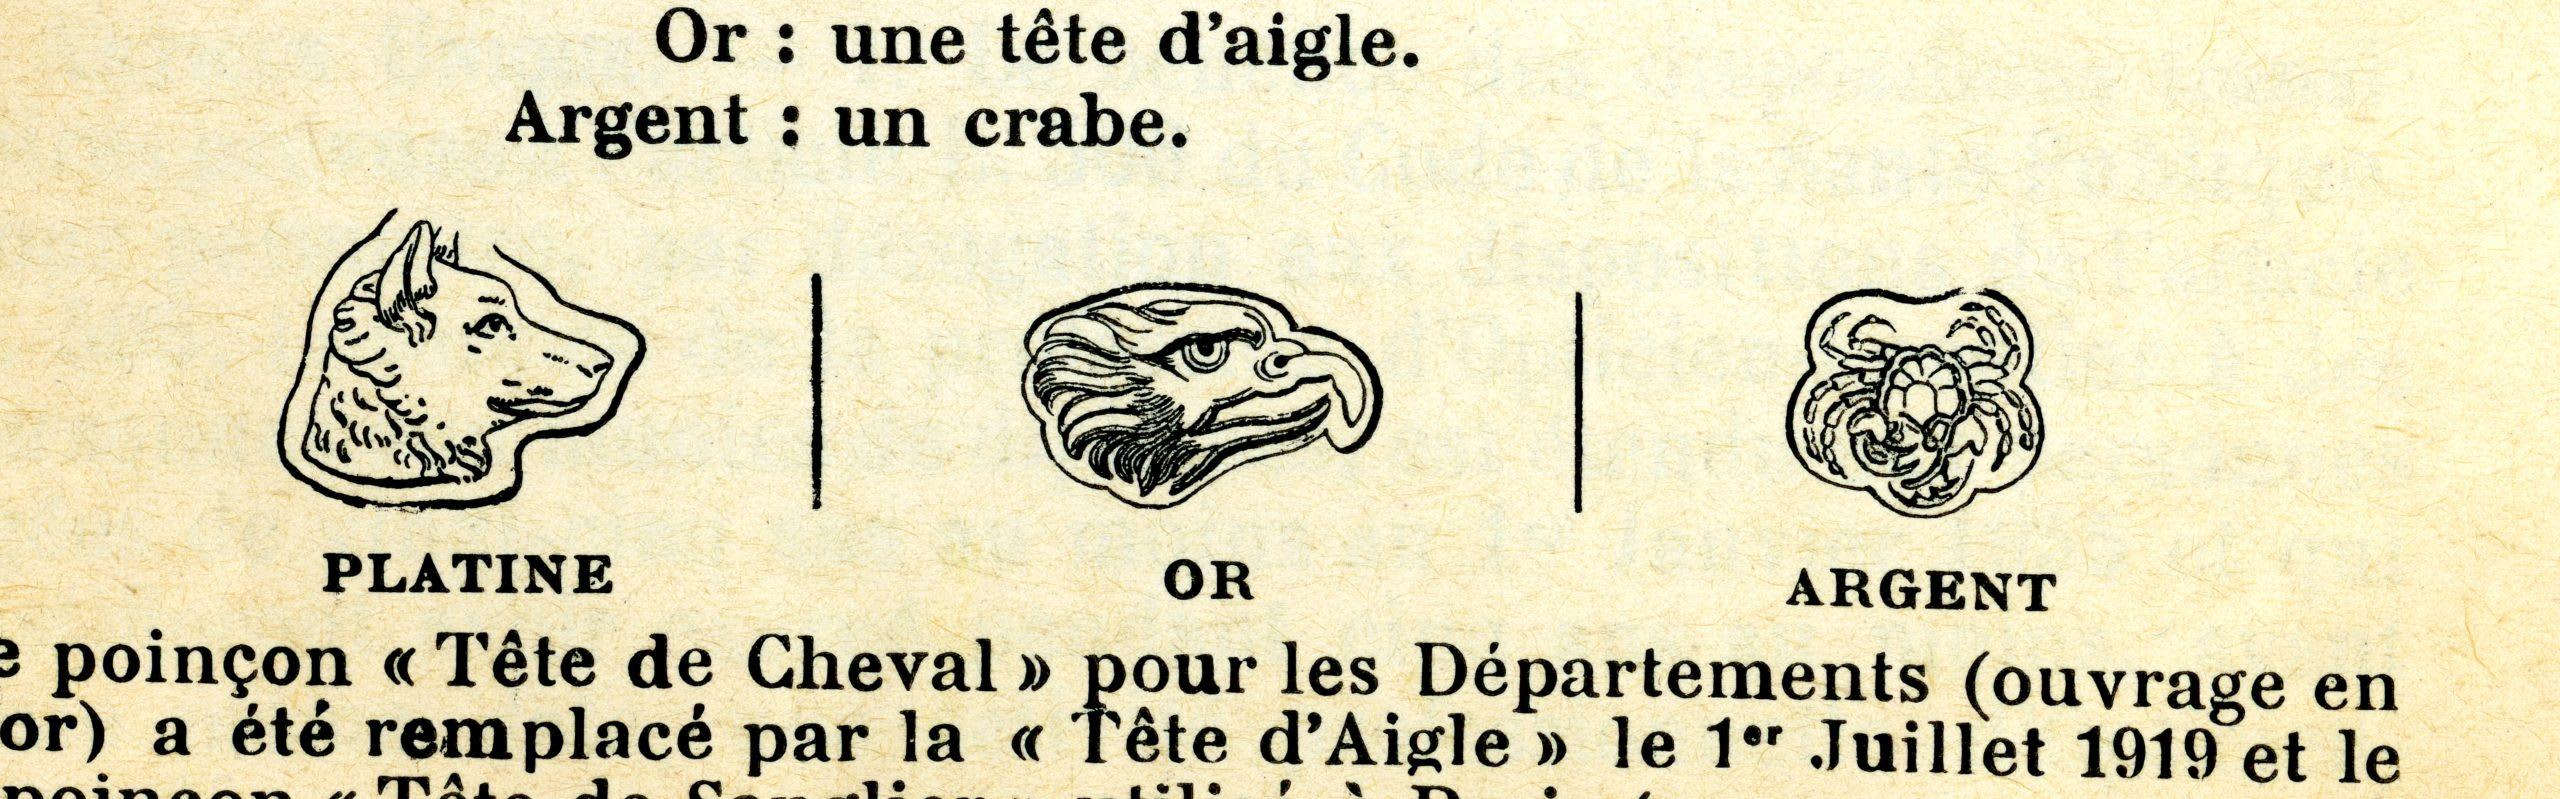 Bidules - Latest - Official Hallmarks are official - illustration 2 -  Lunetterie des Instruments de Précision published in 1970 by Azur-Editions.